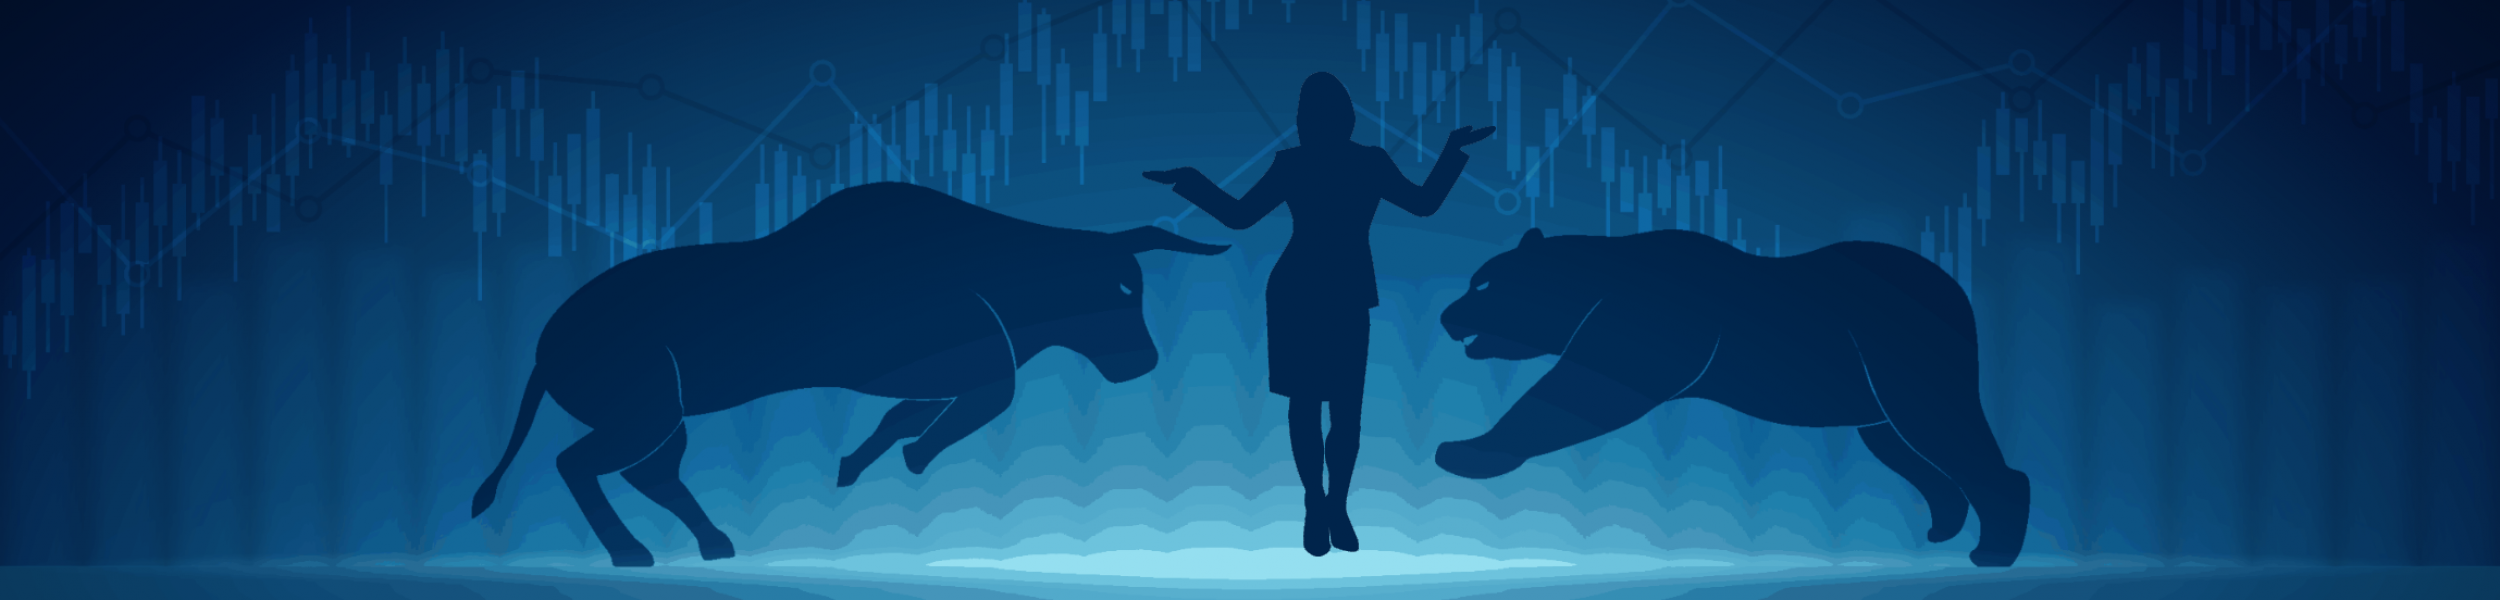 Stock Market Gal Slider 2